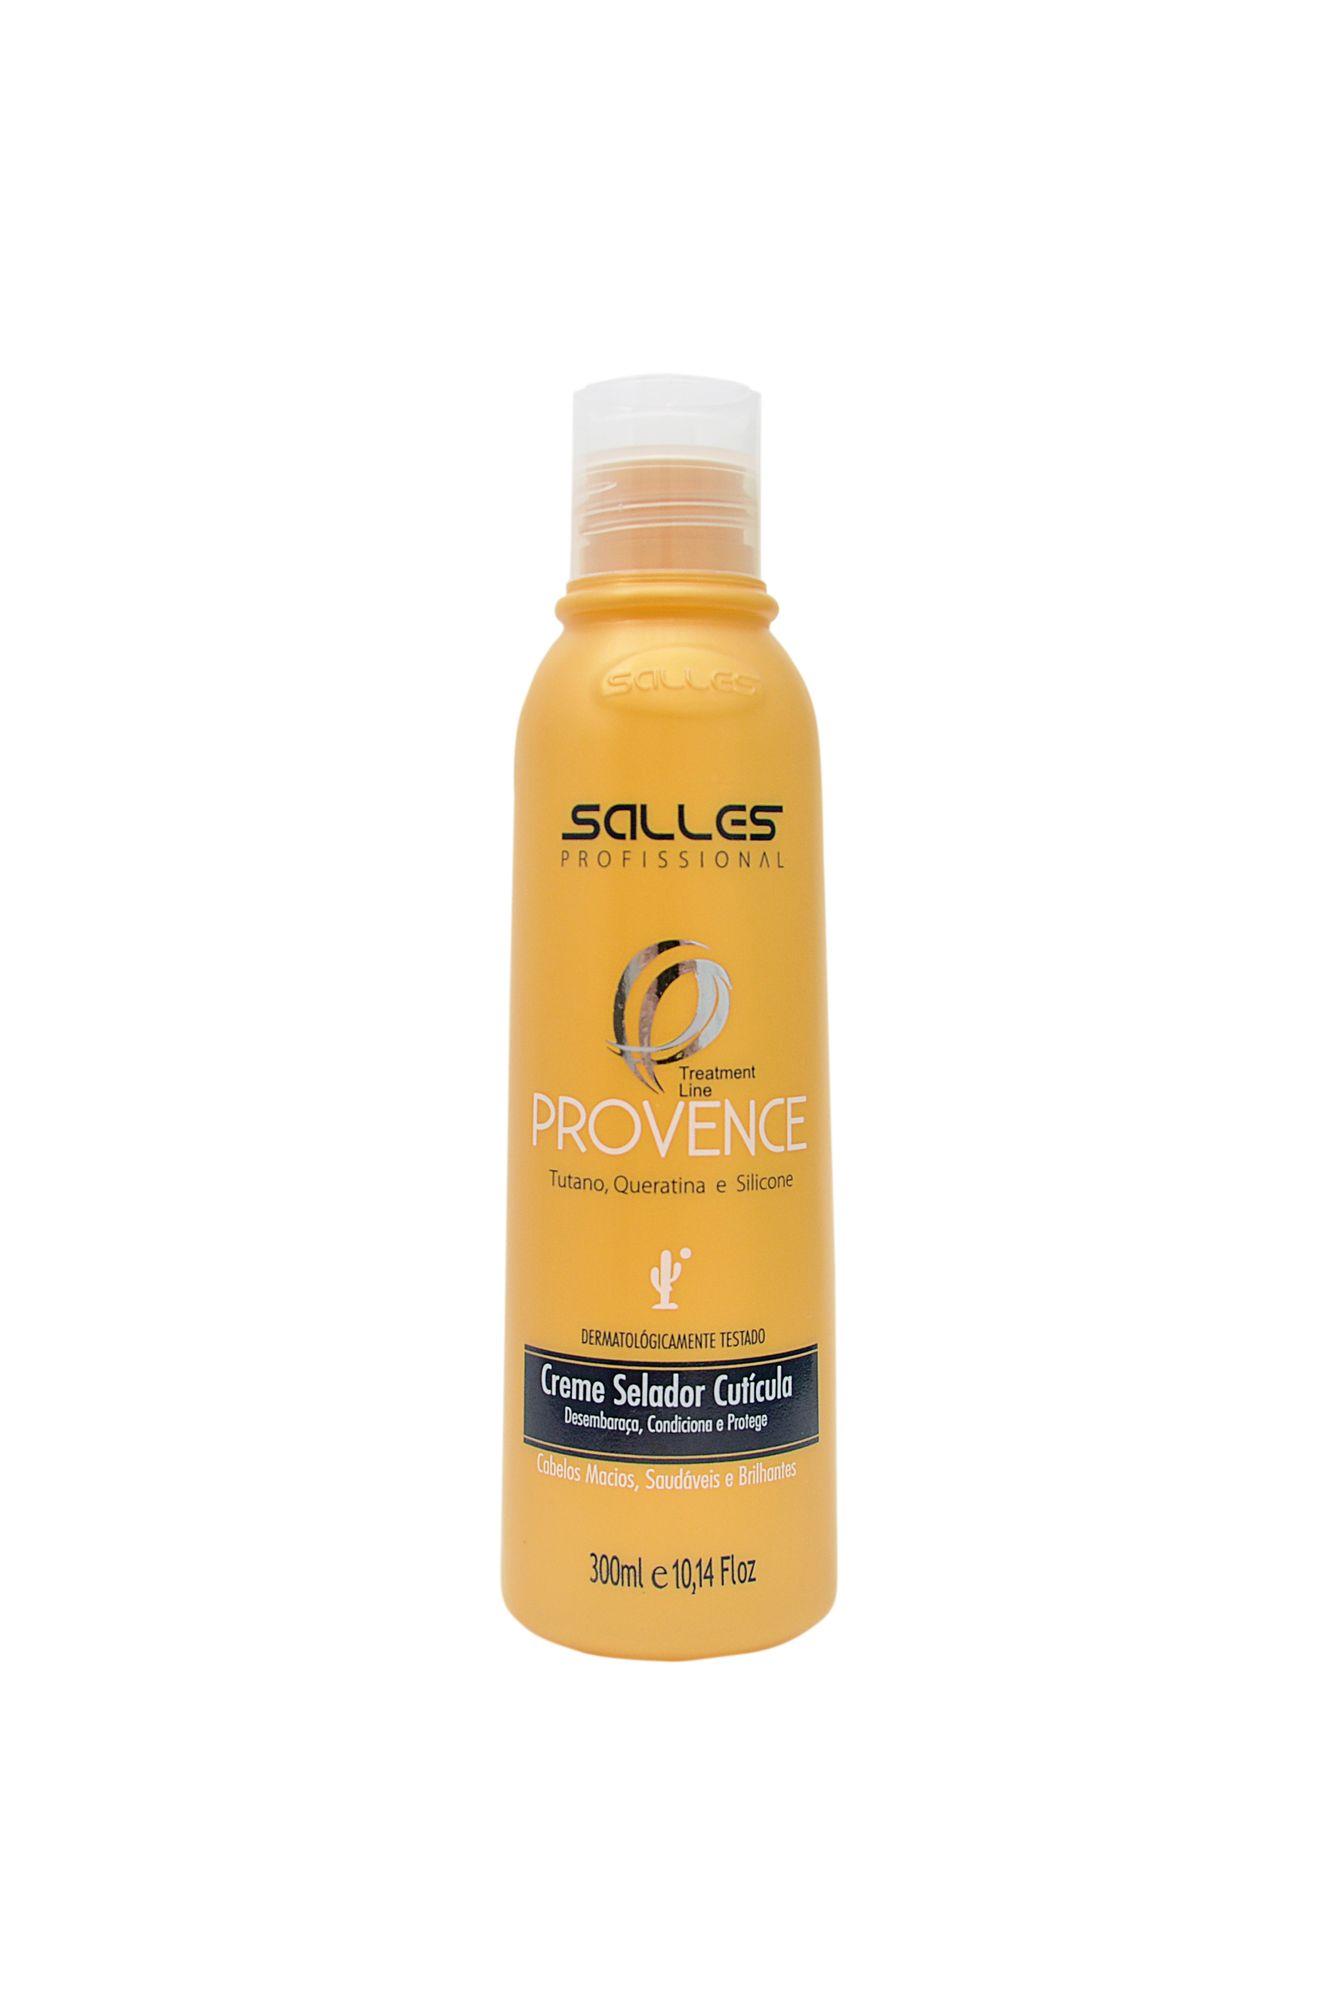 Creme Silicone Treat Line Provence Salles 300ml